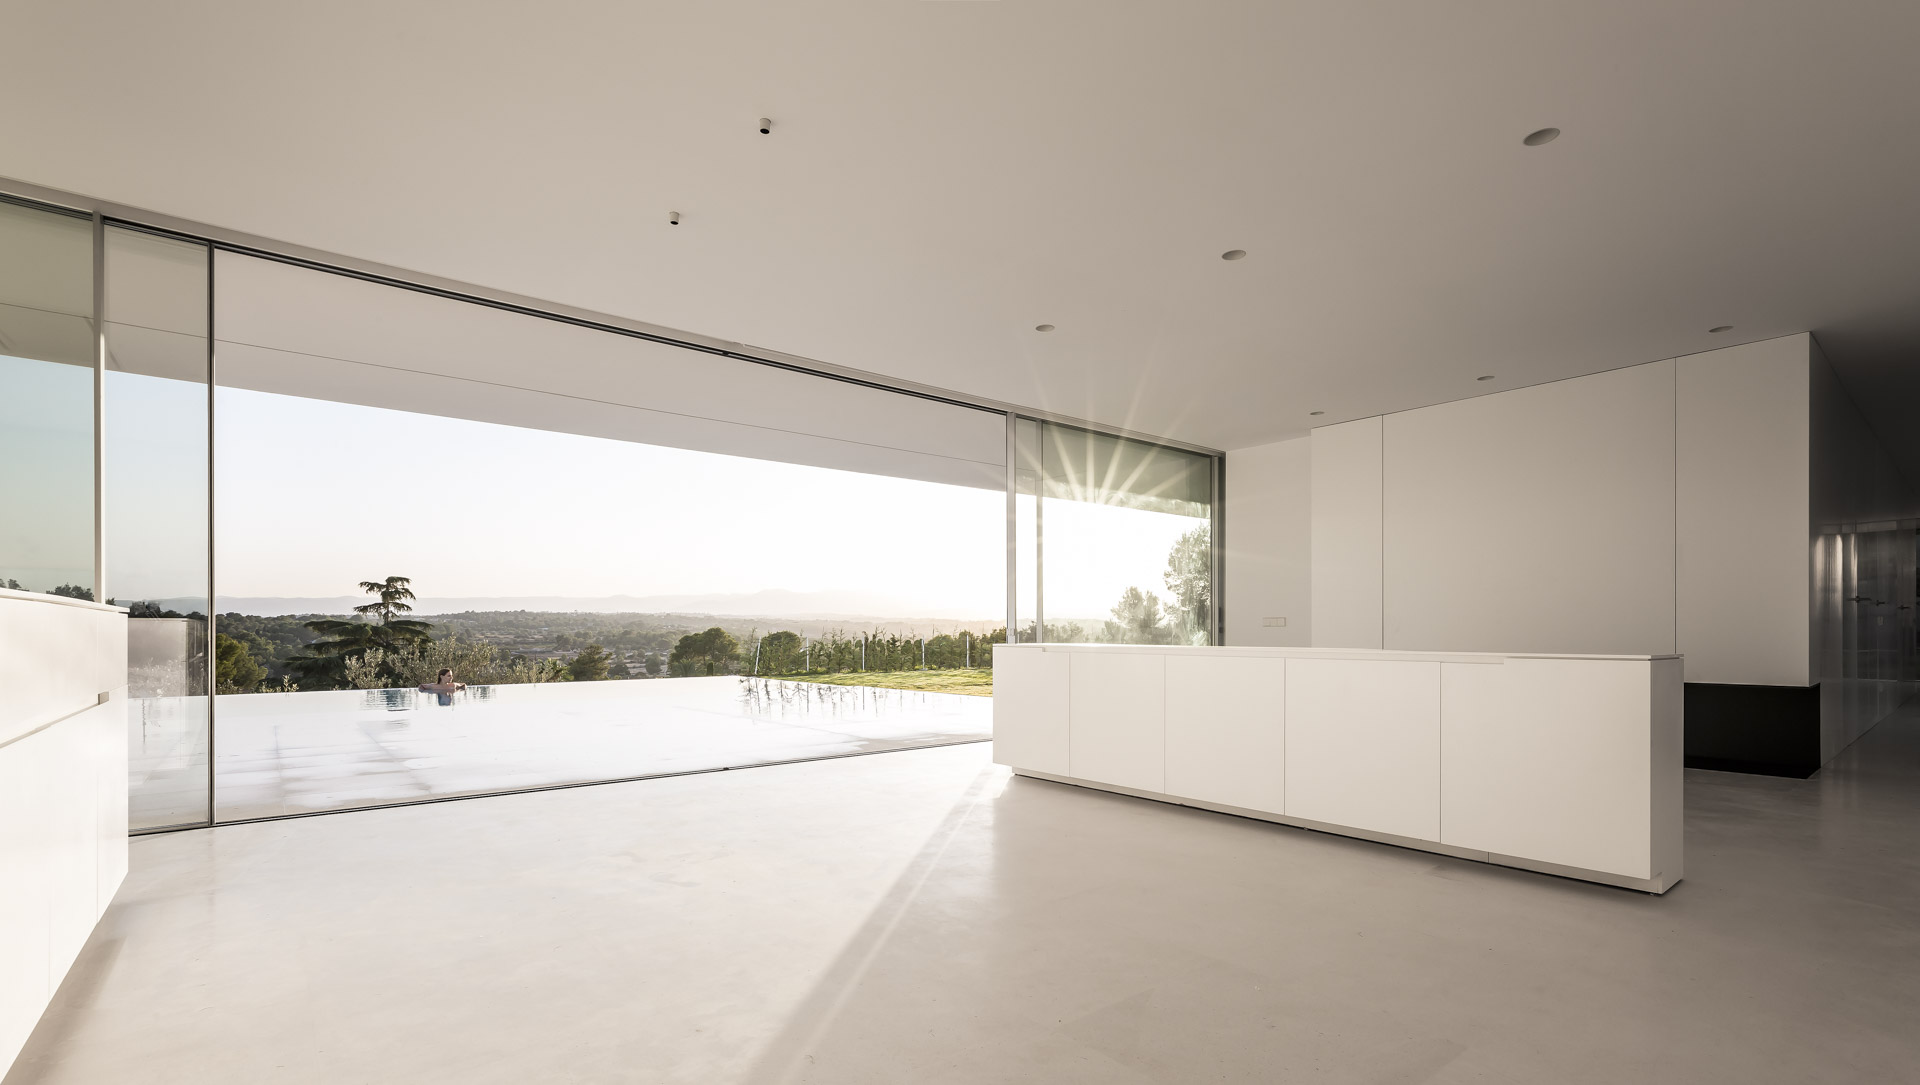 fotografia-arquitectura-valencia-german-cabo-gallardo-llopis-villamarchante-vivienda-52